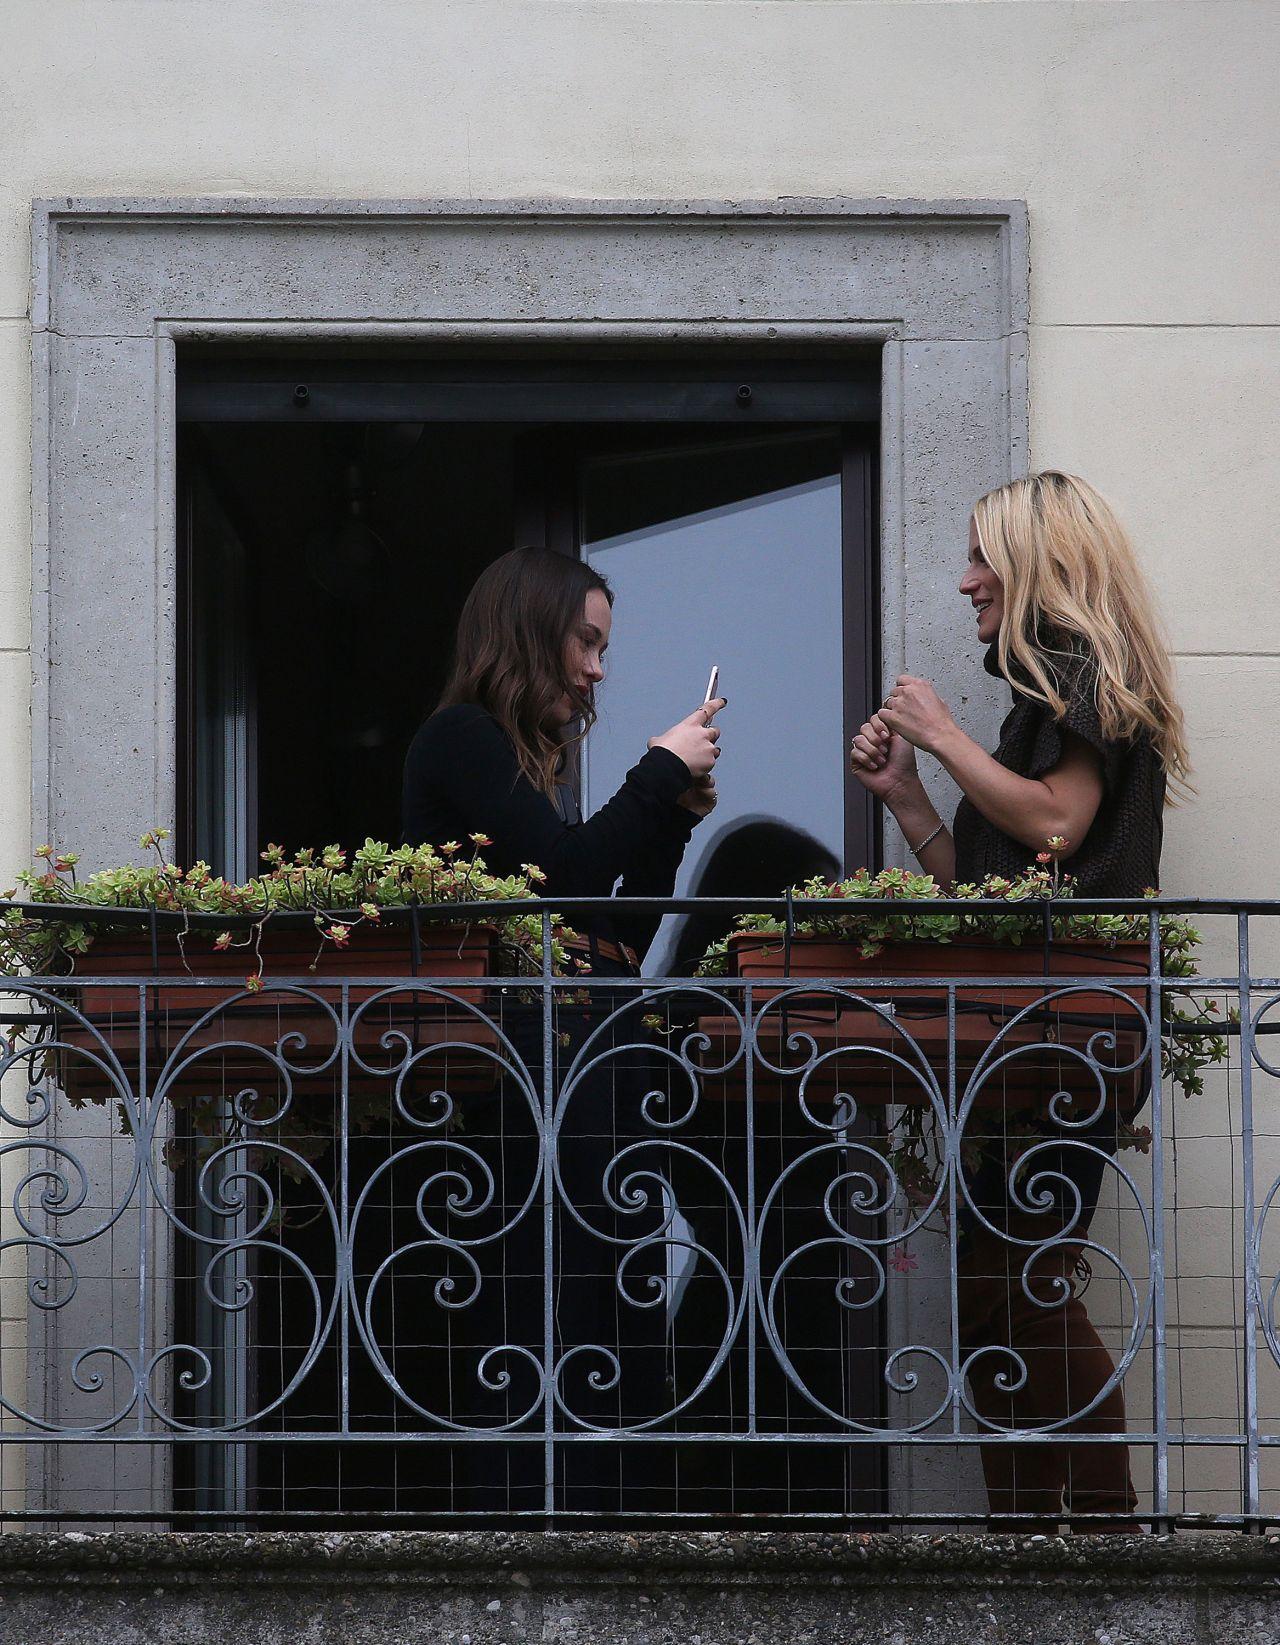 Michelle Hunziker - Poses on a Balcony in Milan 11/13/2017